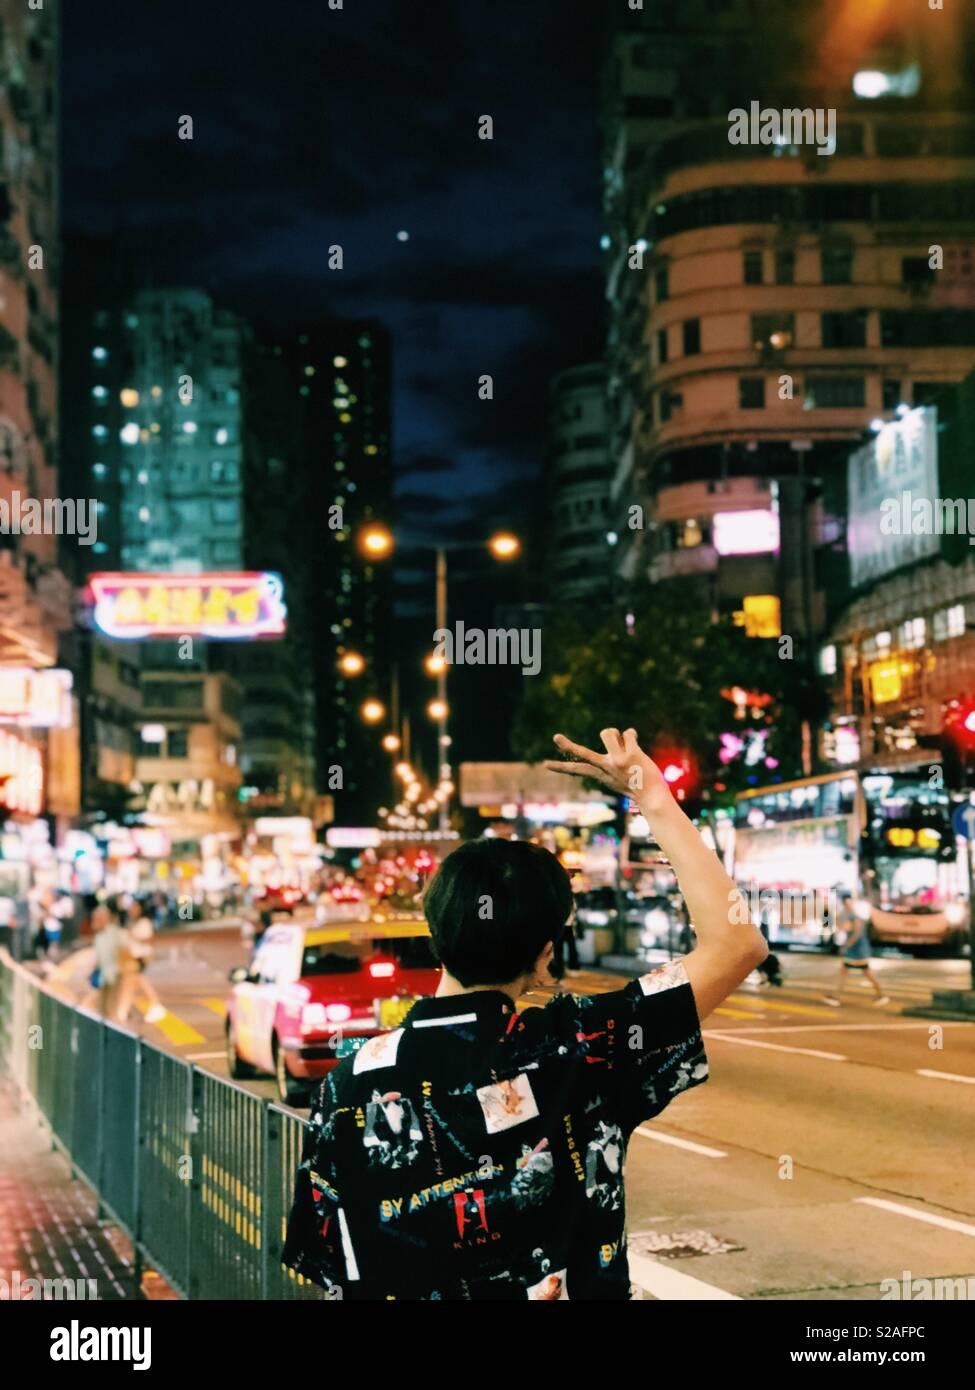 City Light✨ - Stock Image